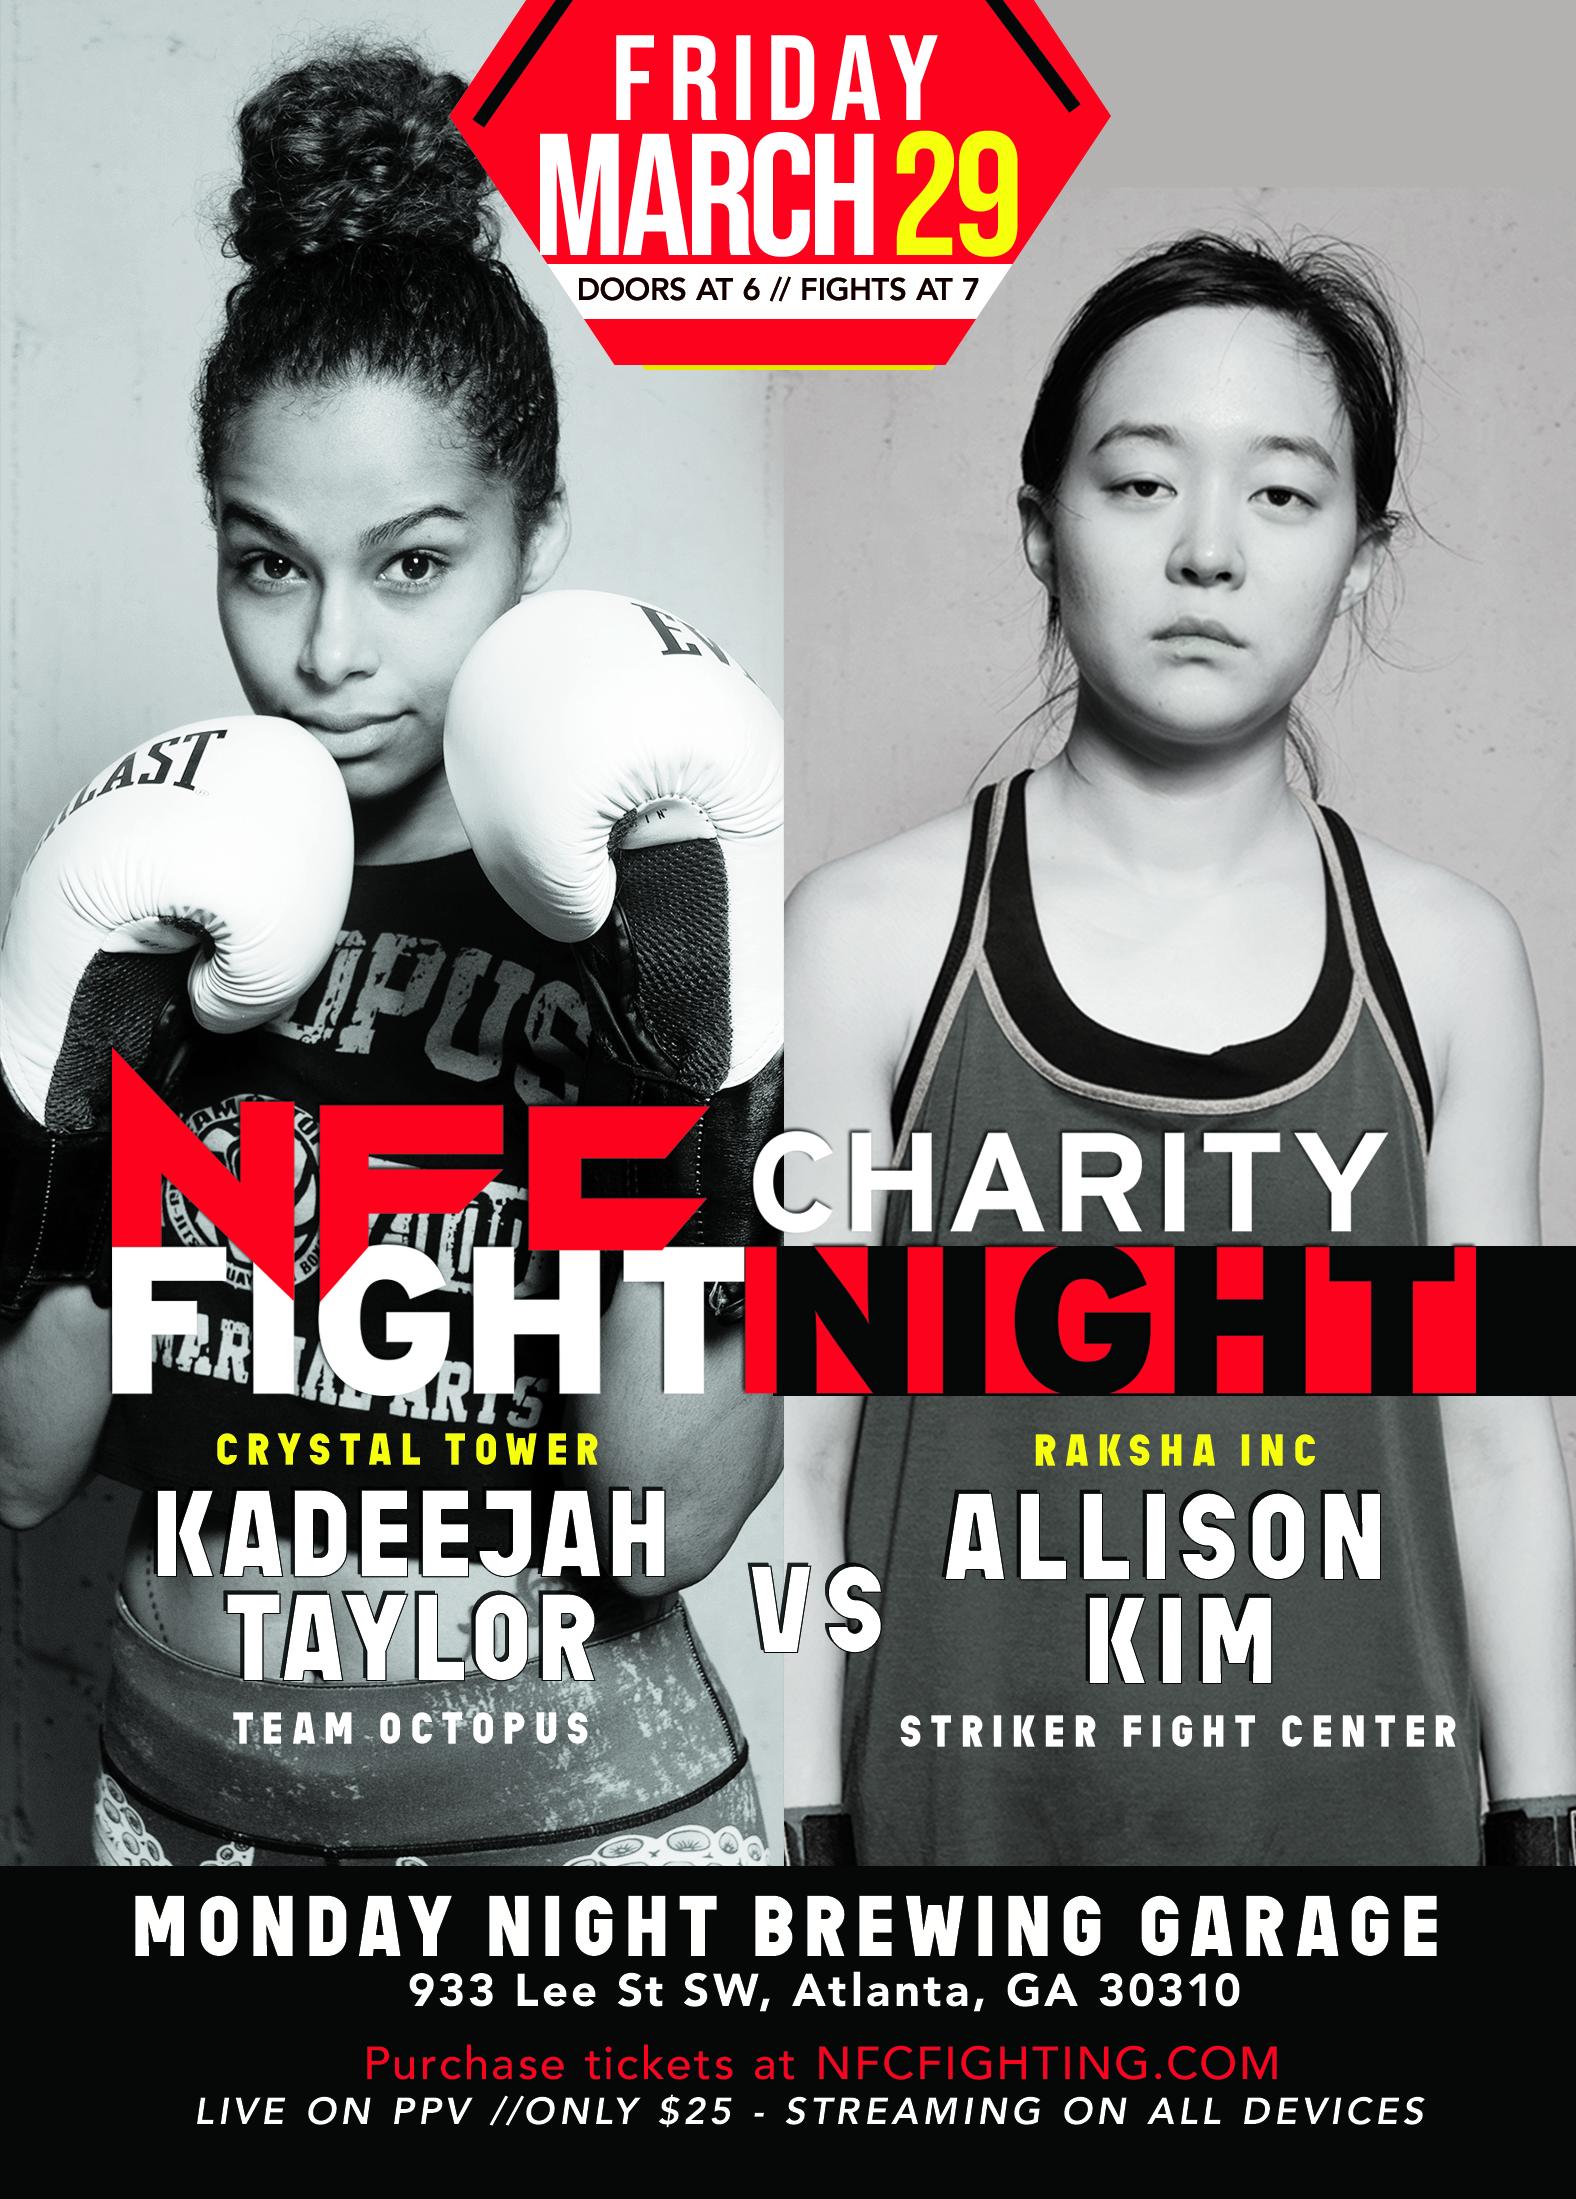 FightNightCharity_TaylorKim.jpg